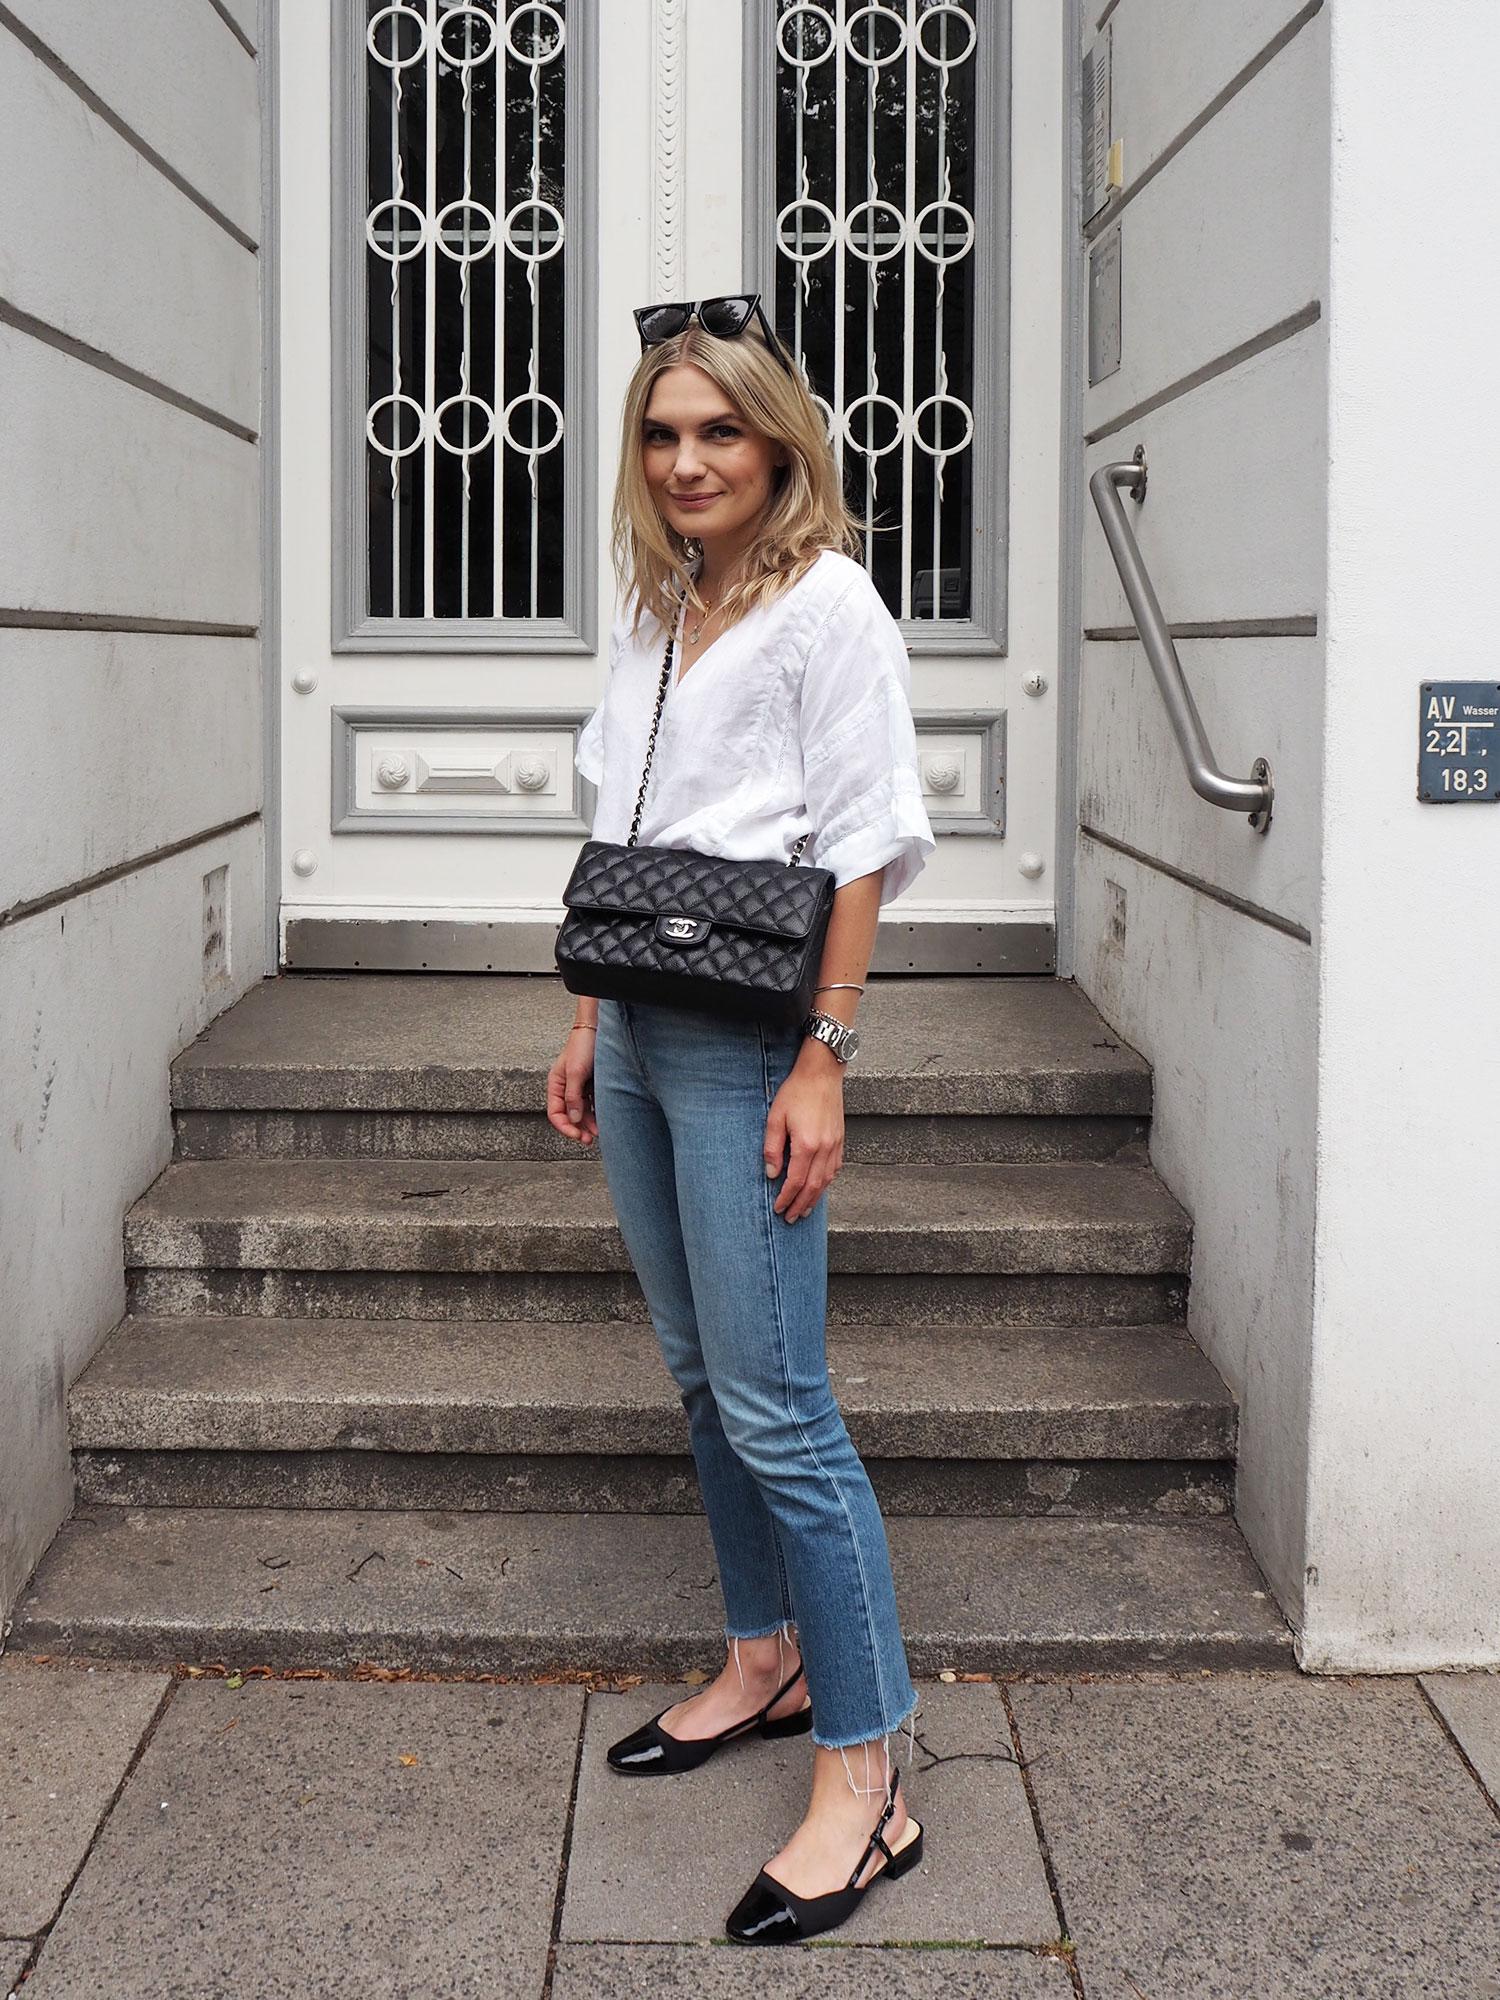 RosyCheeks-blog-small-Chanel-bag-5